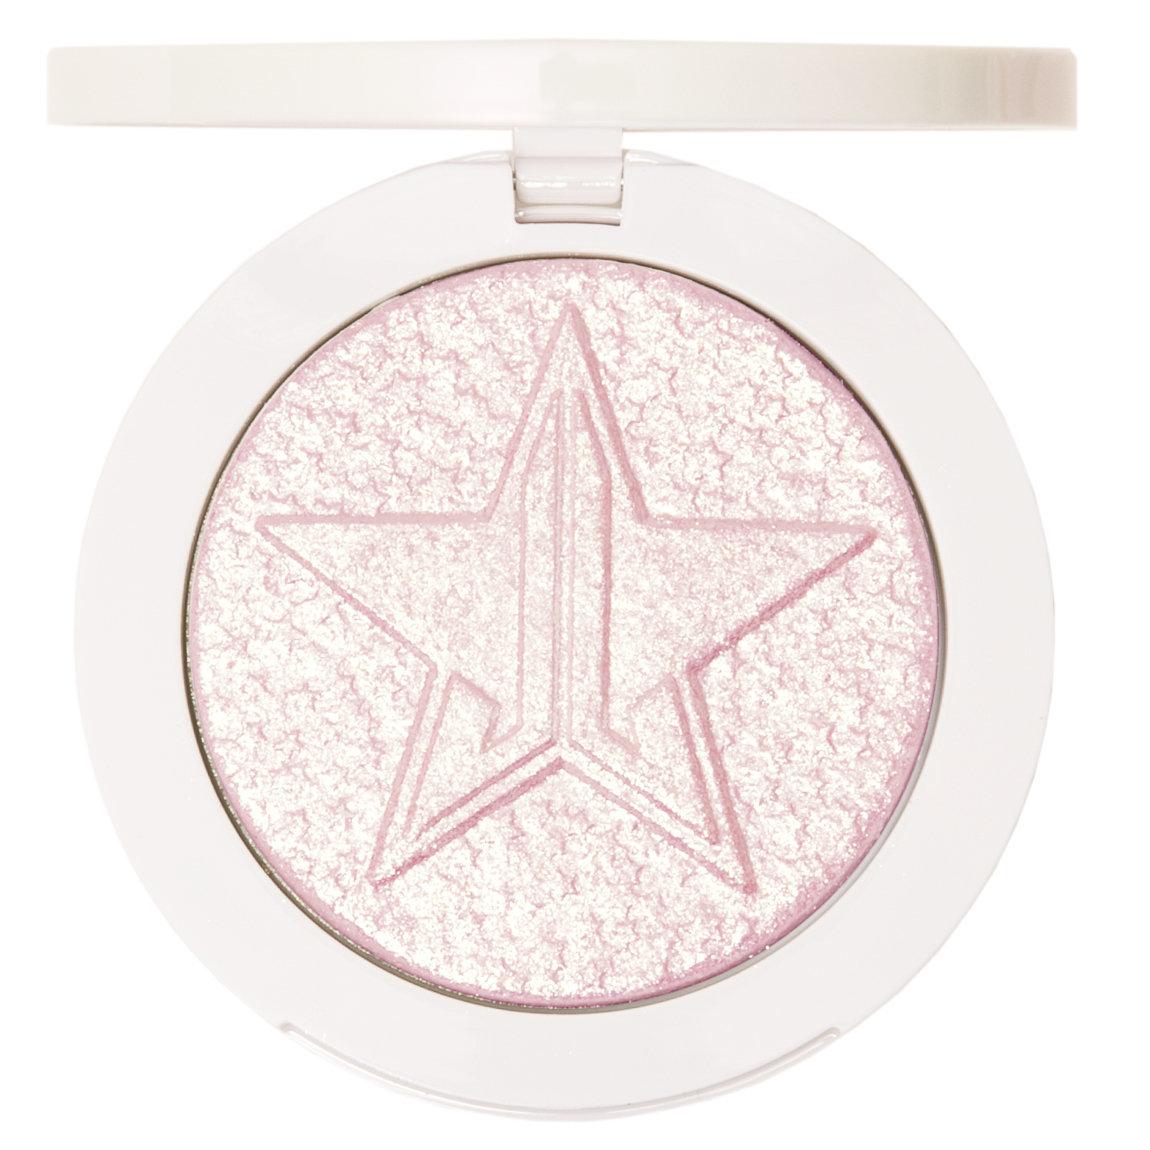 Jeffree Star Cosmetics Extreme Frost Lick My Glit alternative view 1 - product swatch.